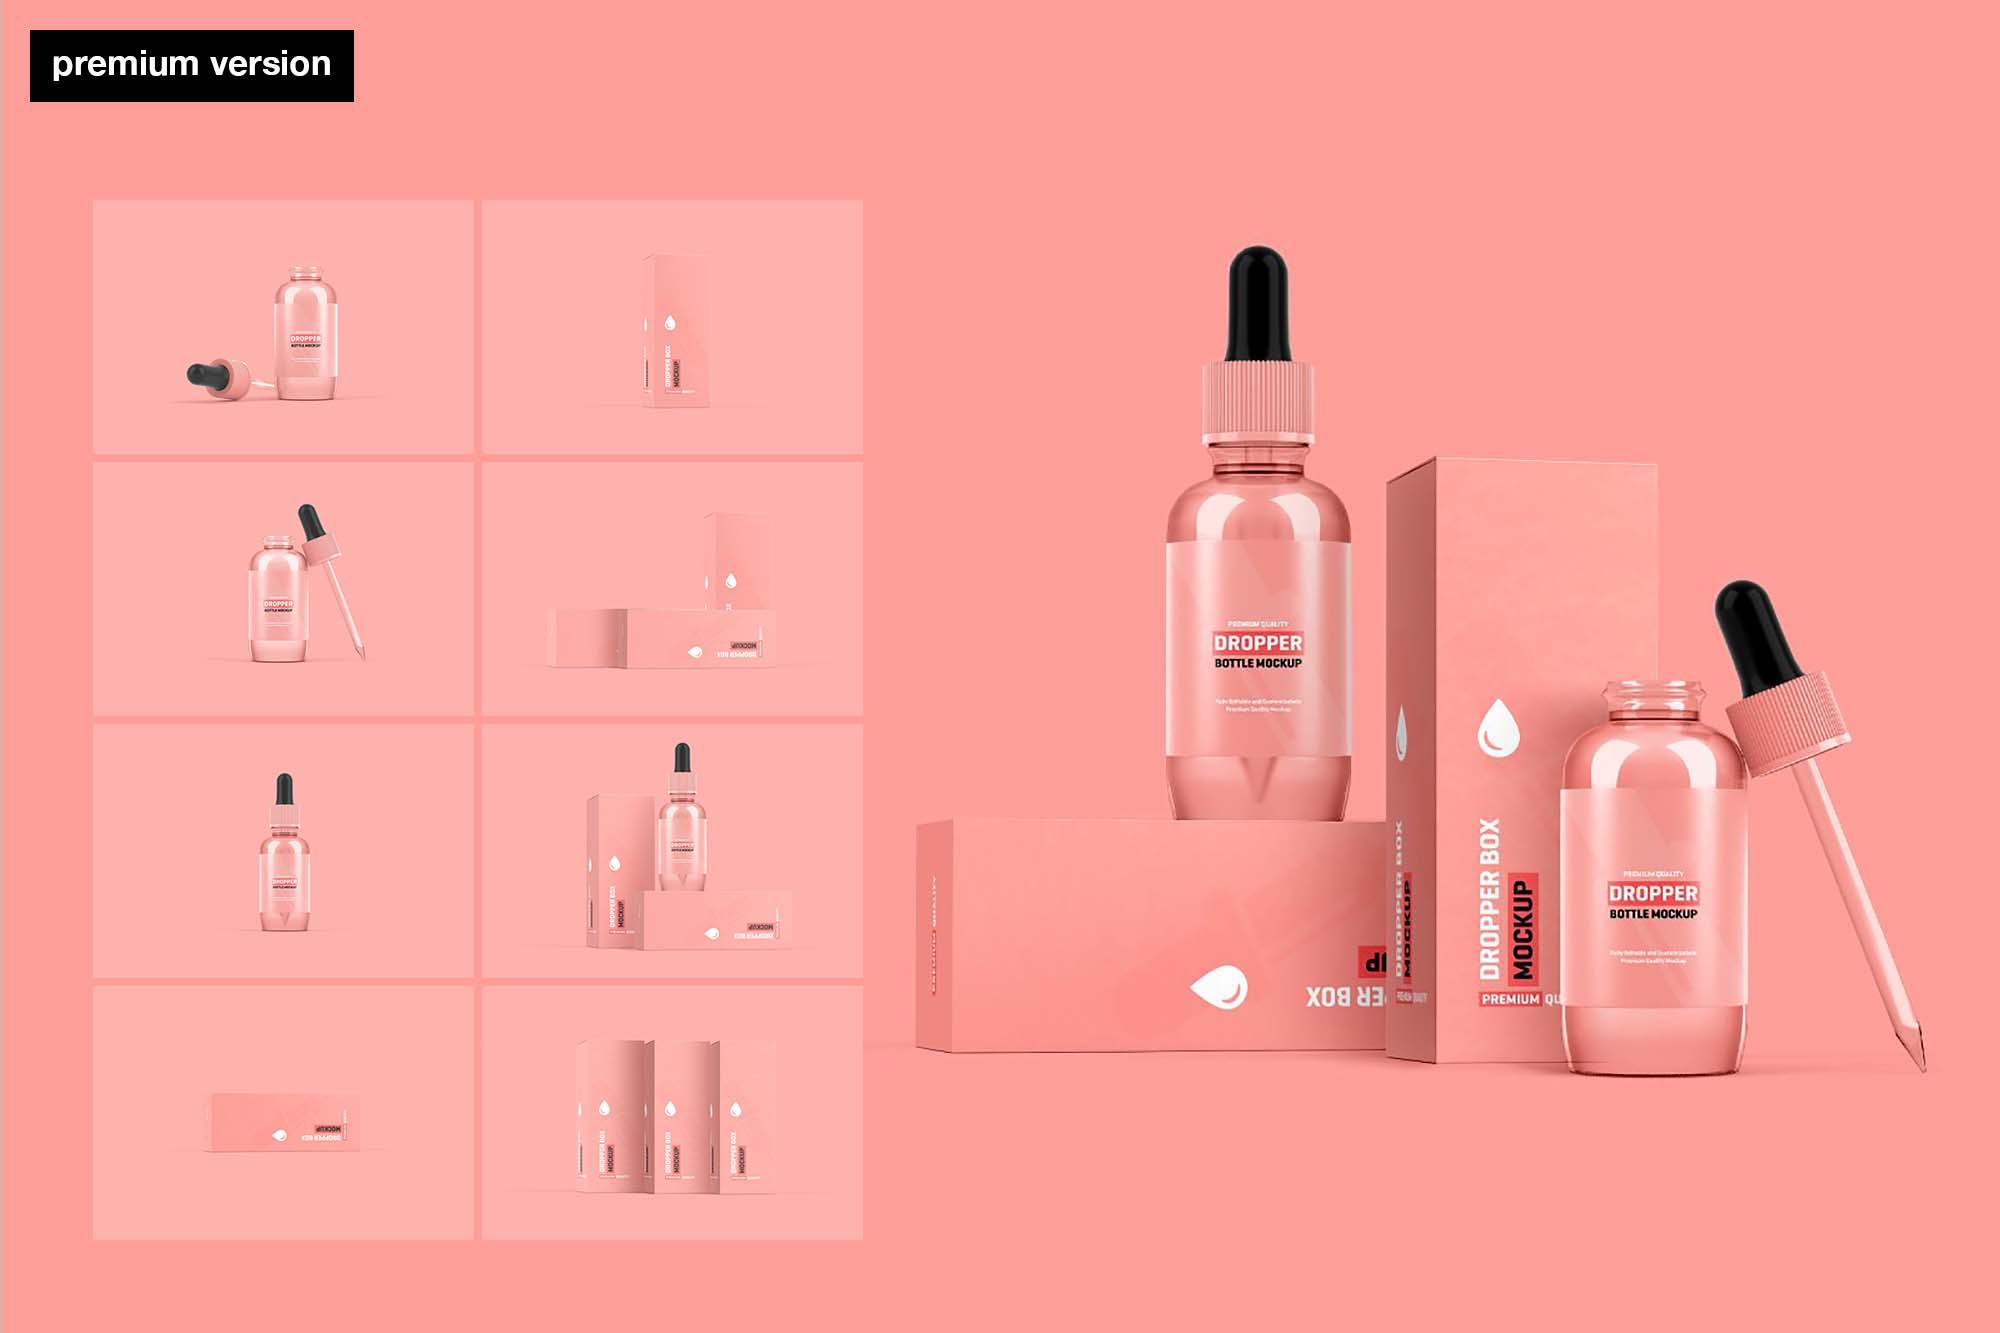 Dropper Bottle Packaging Mockup - Premium